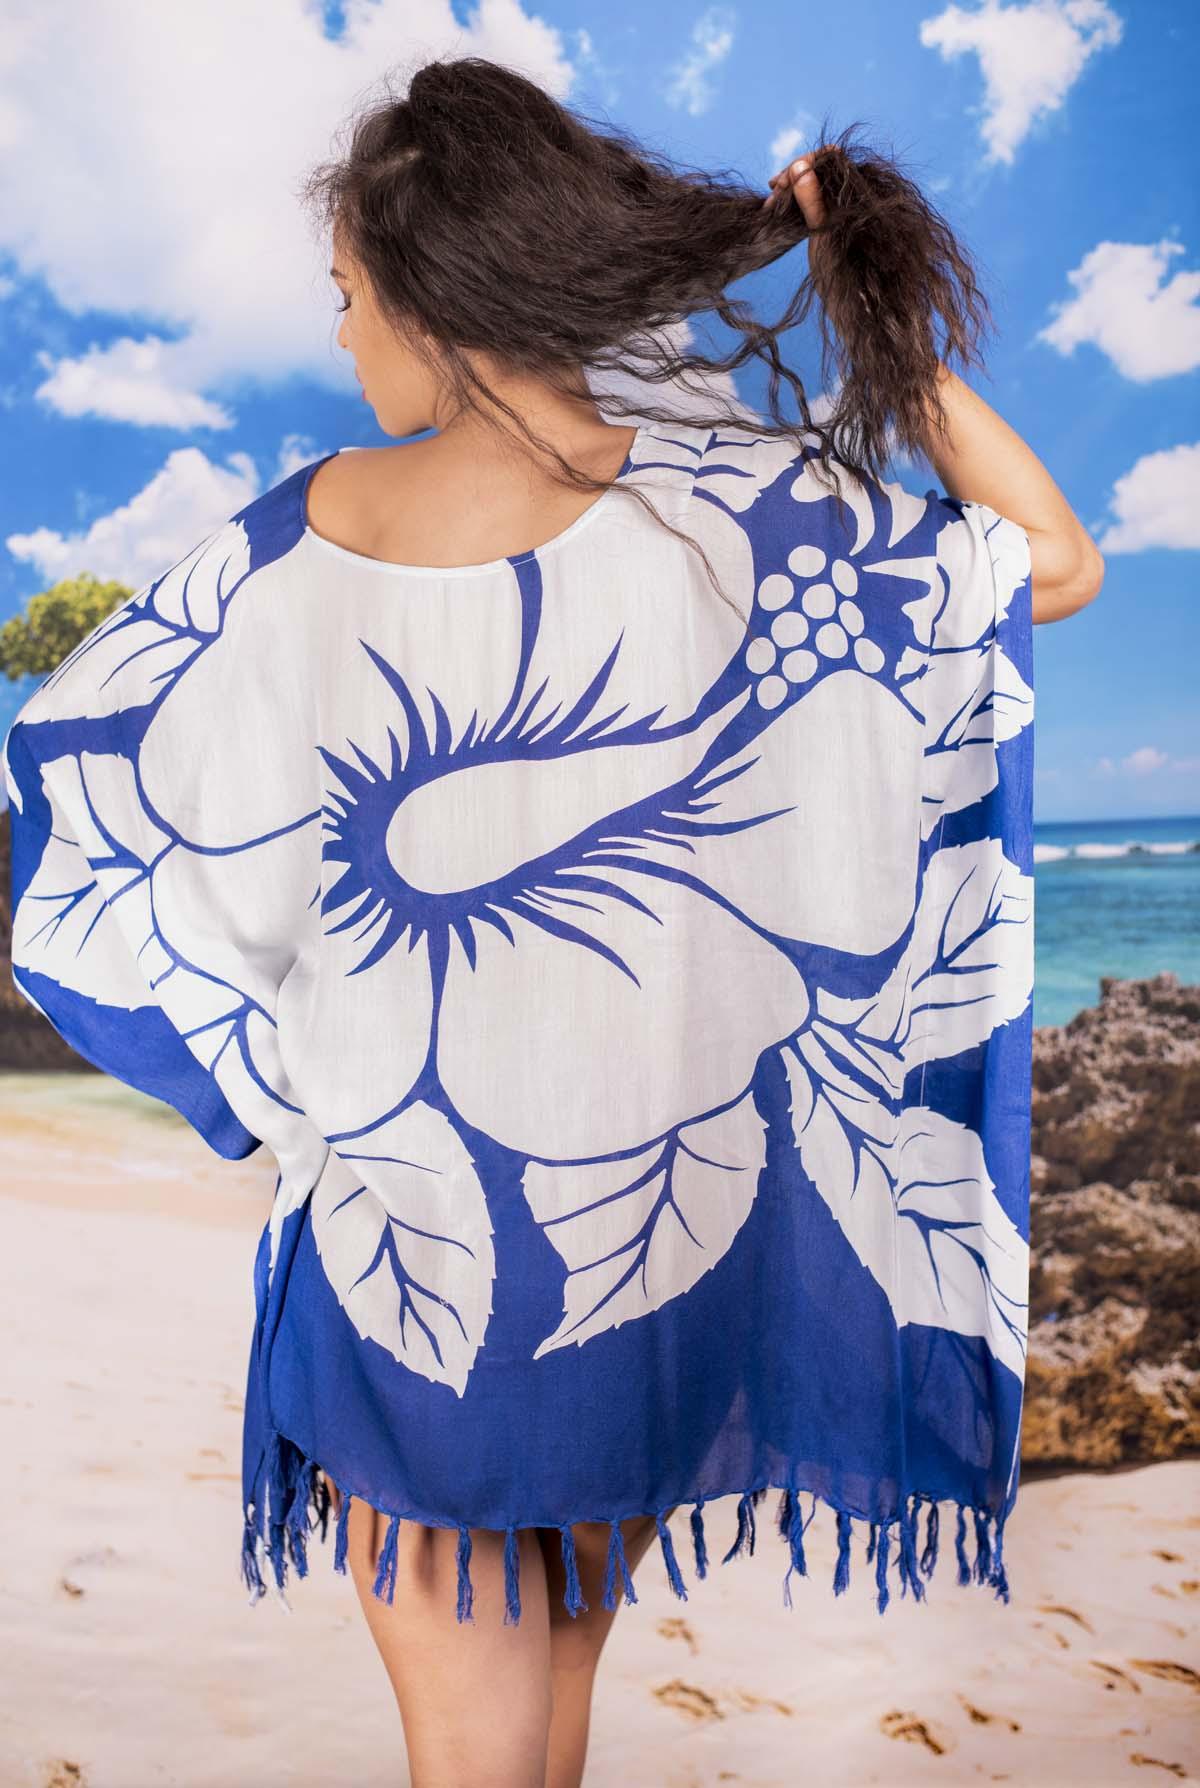 Плажна Туника в Синьо с Бели Цветя